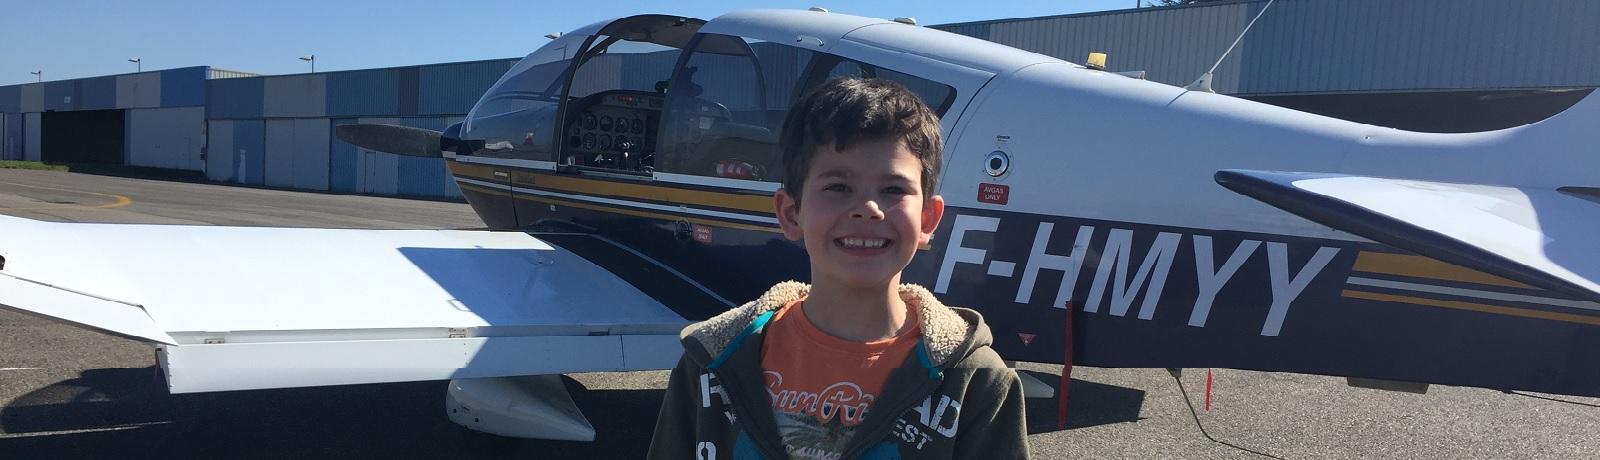 Aydan en avion